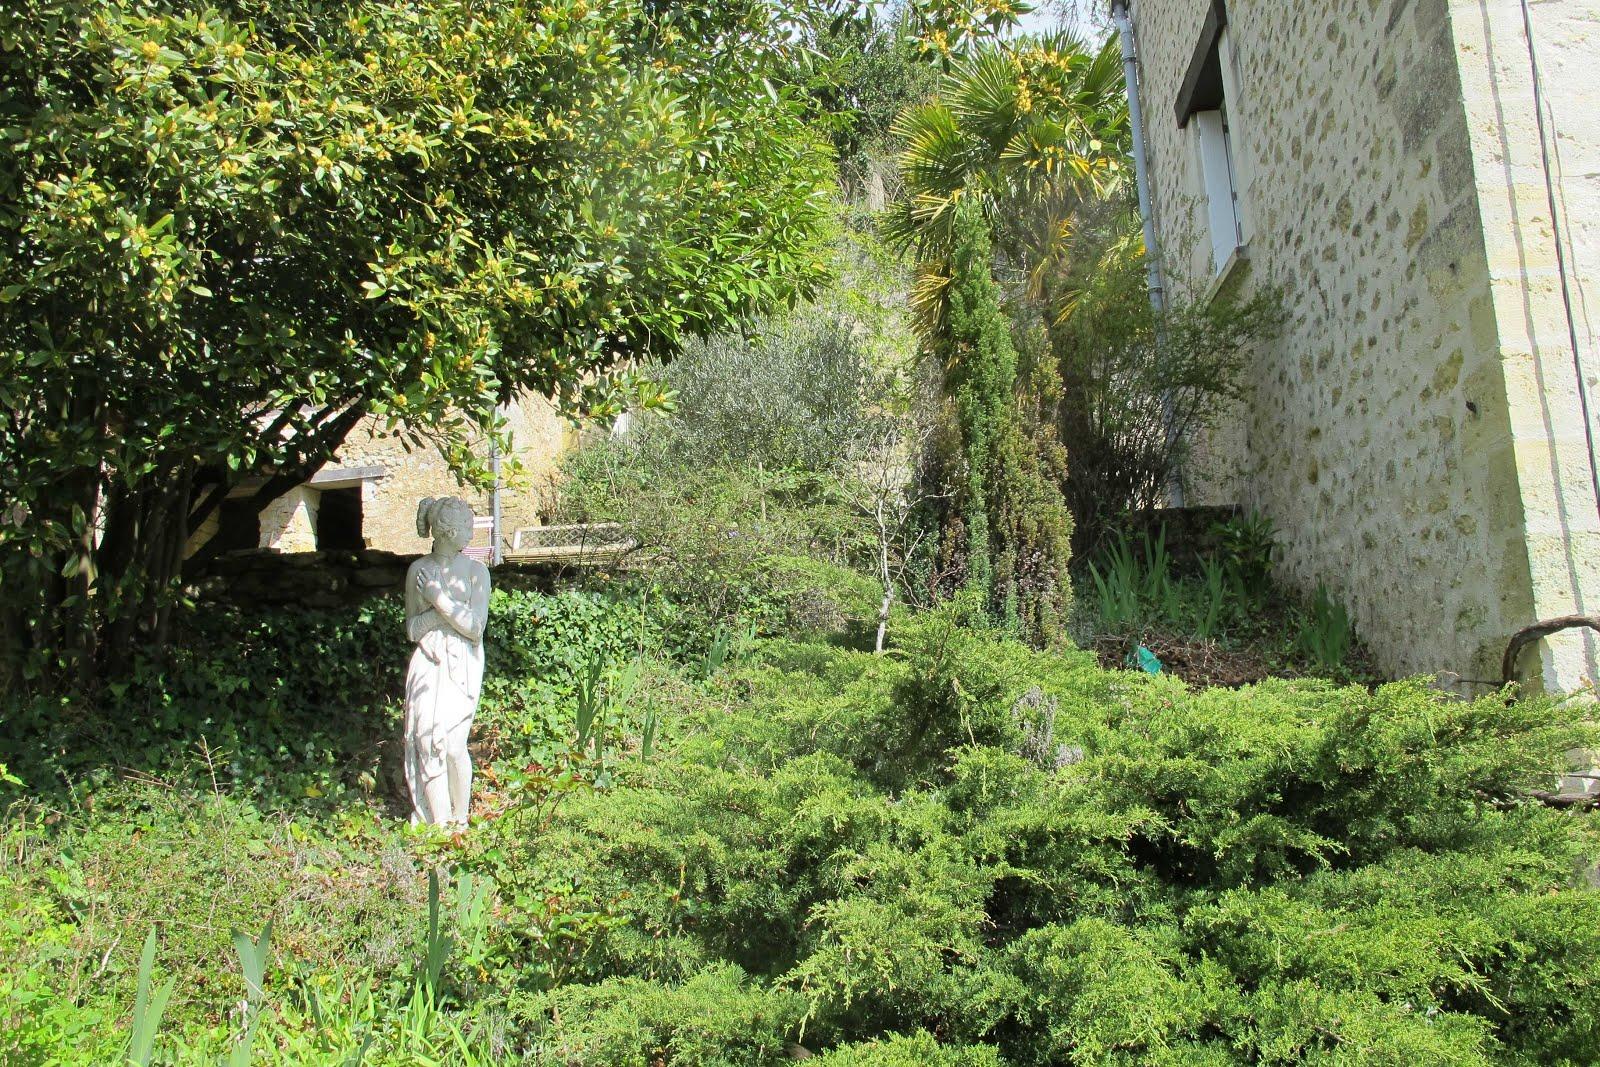 (4) Songbird Sanctuary